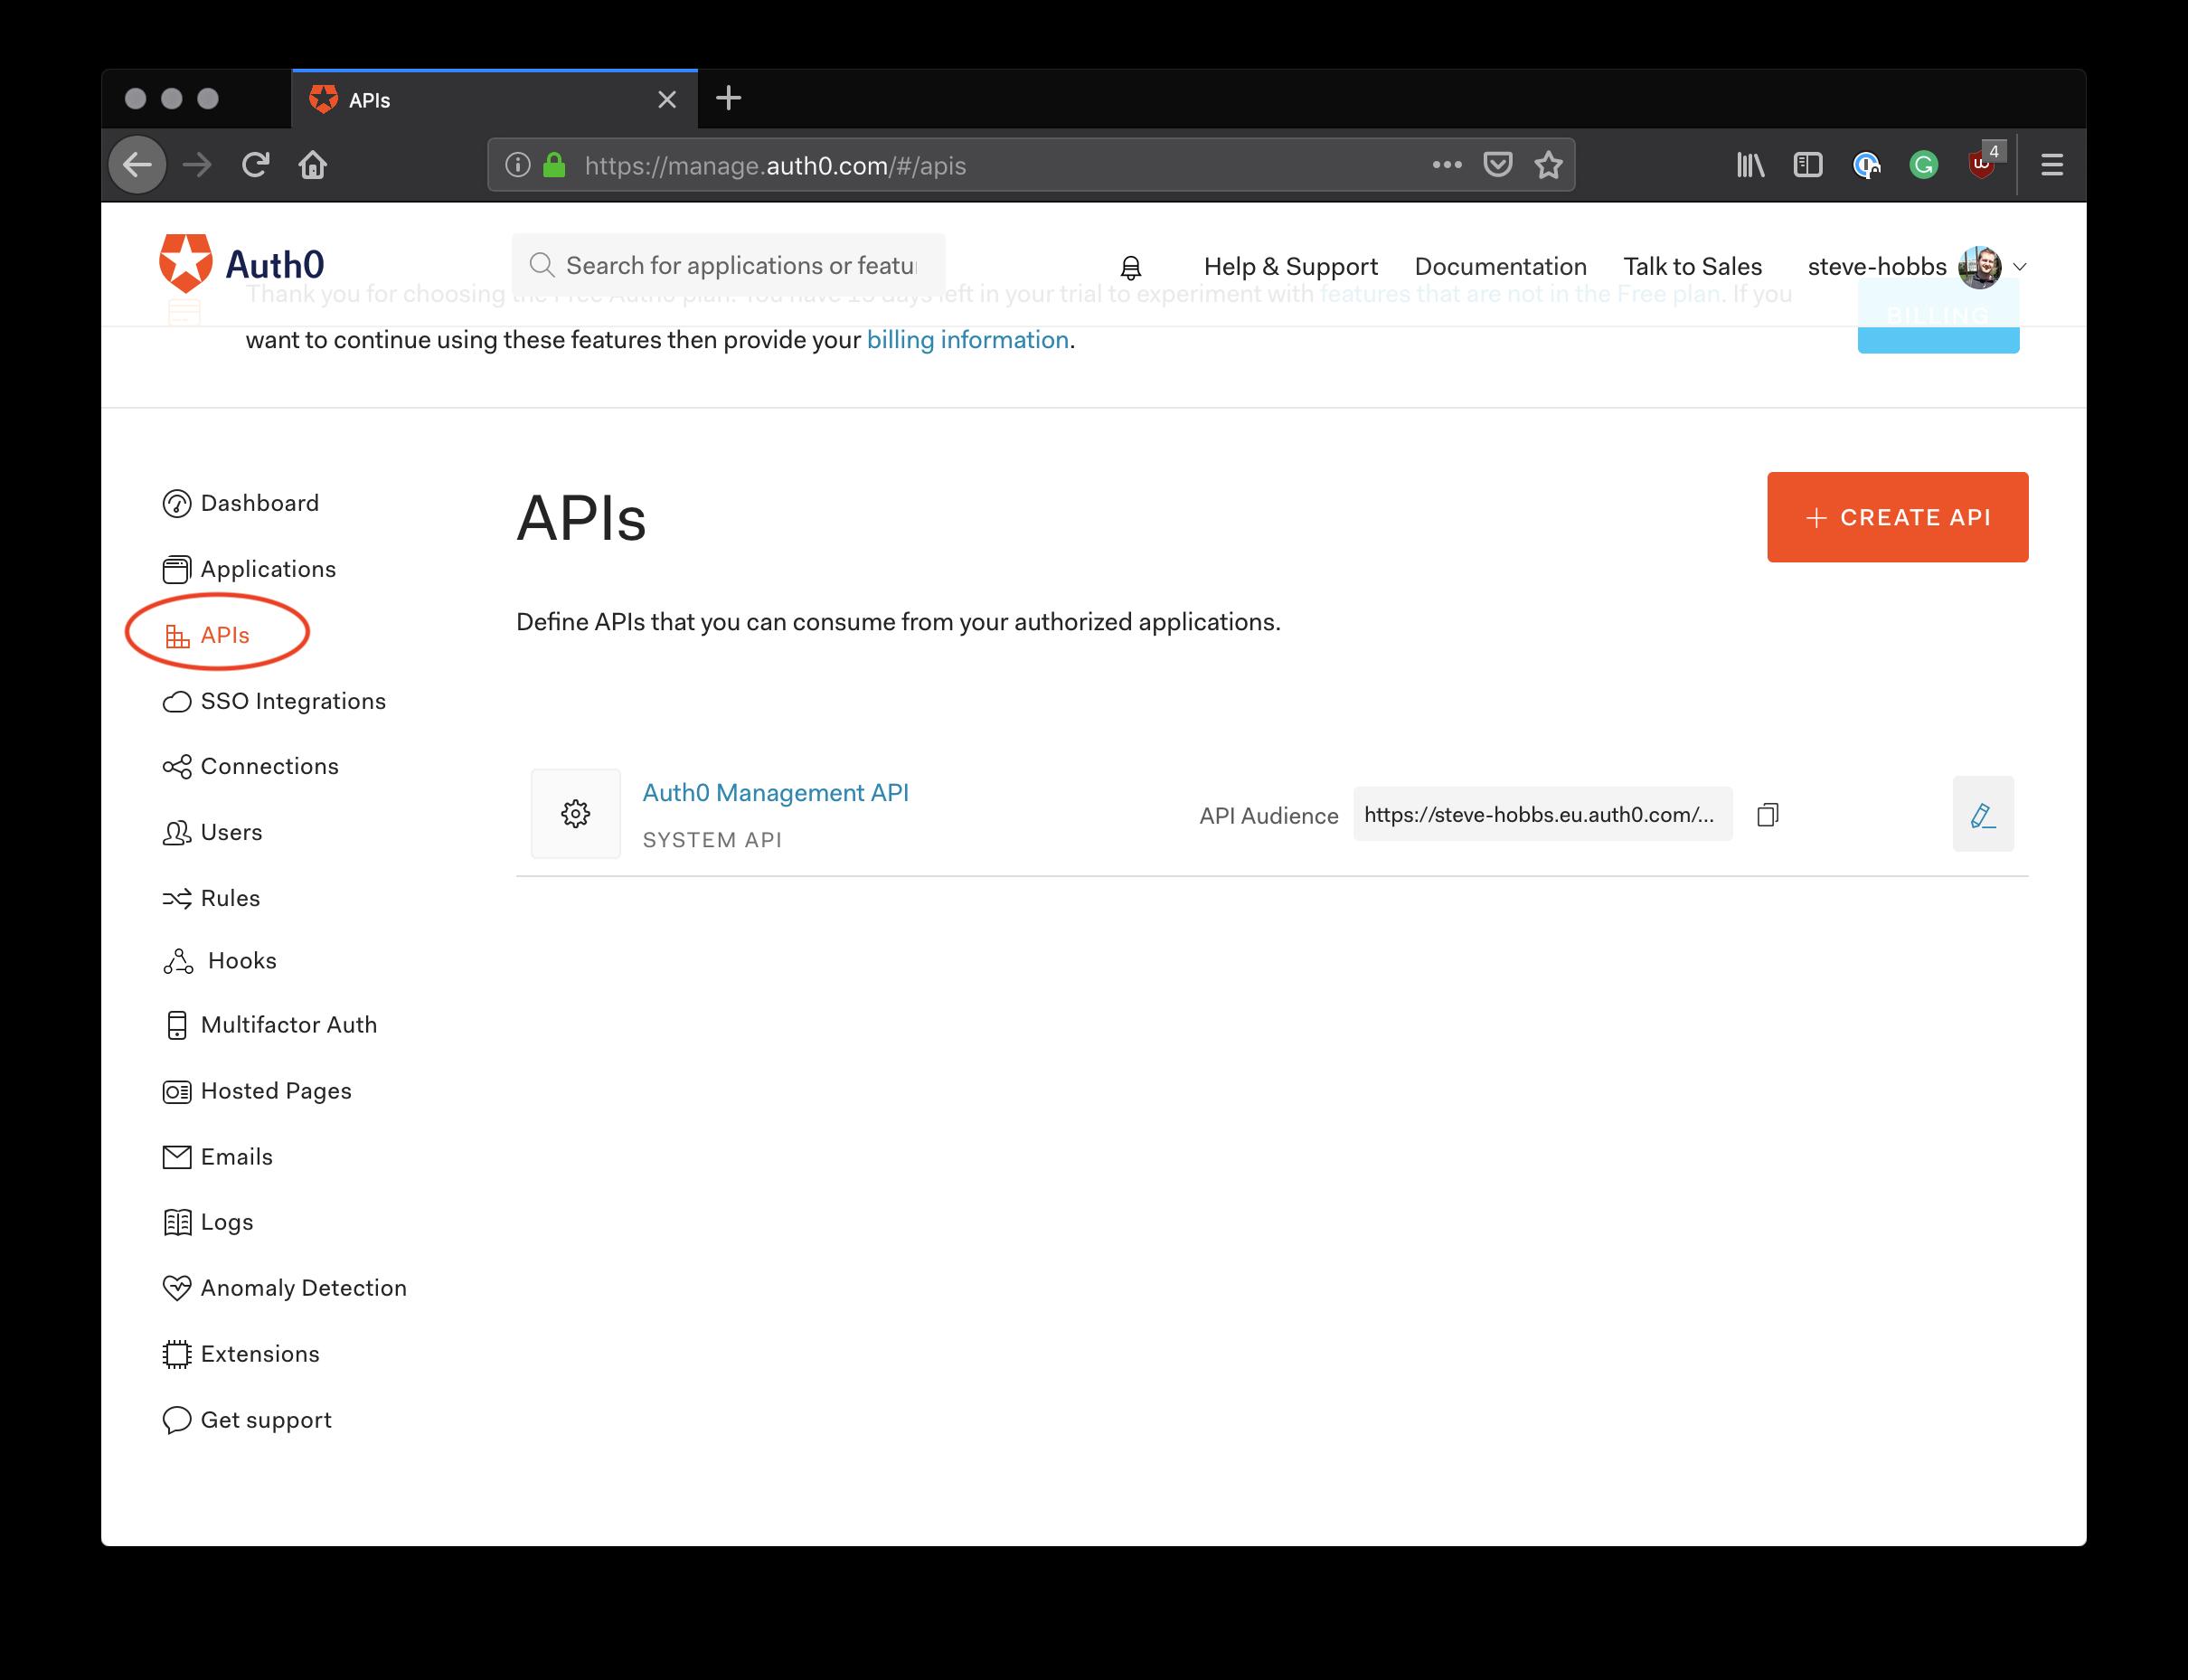 The Auth0 API dashboard